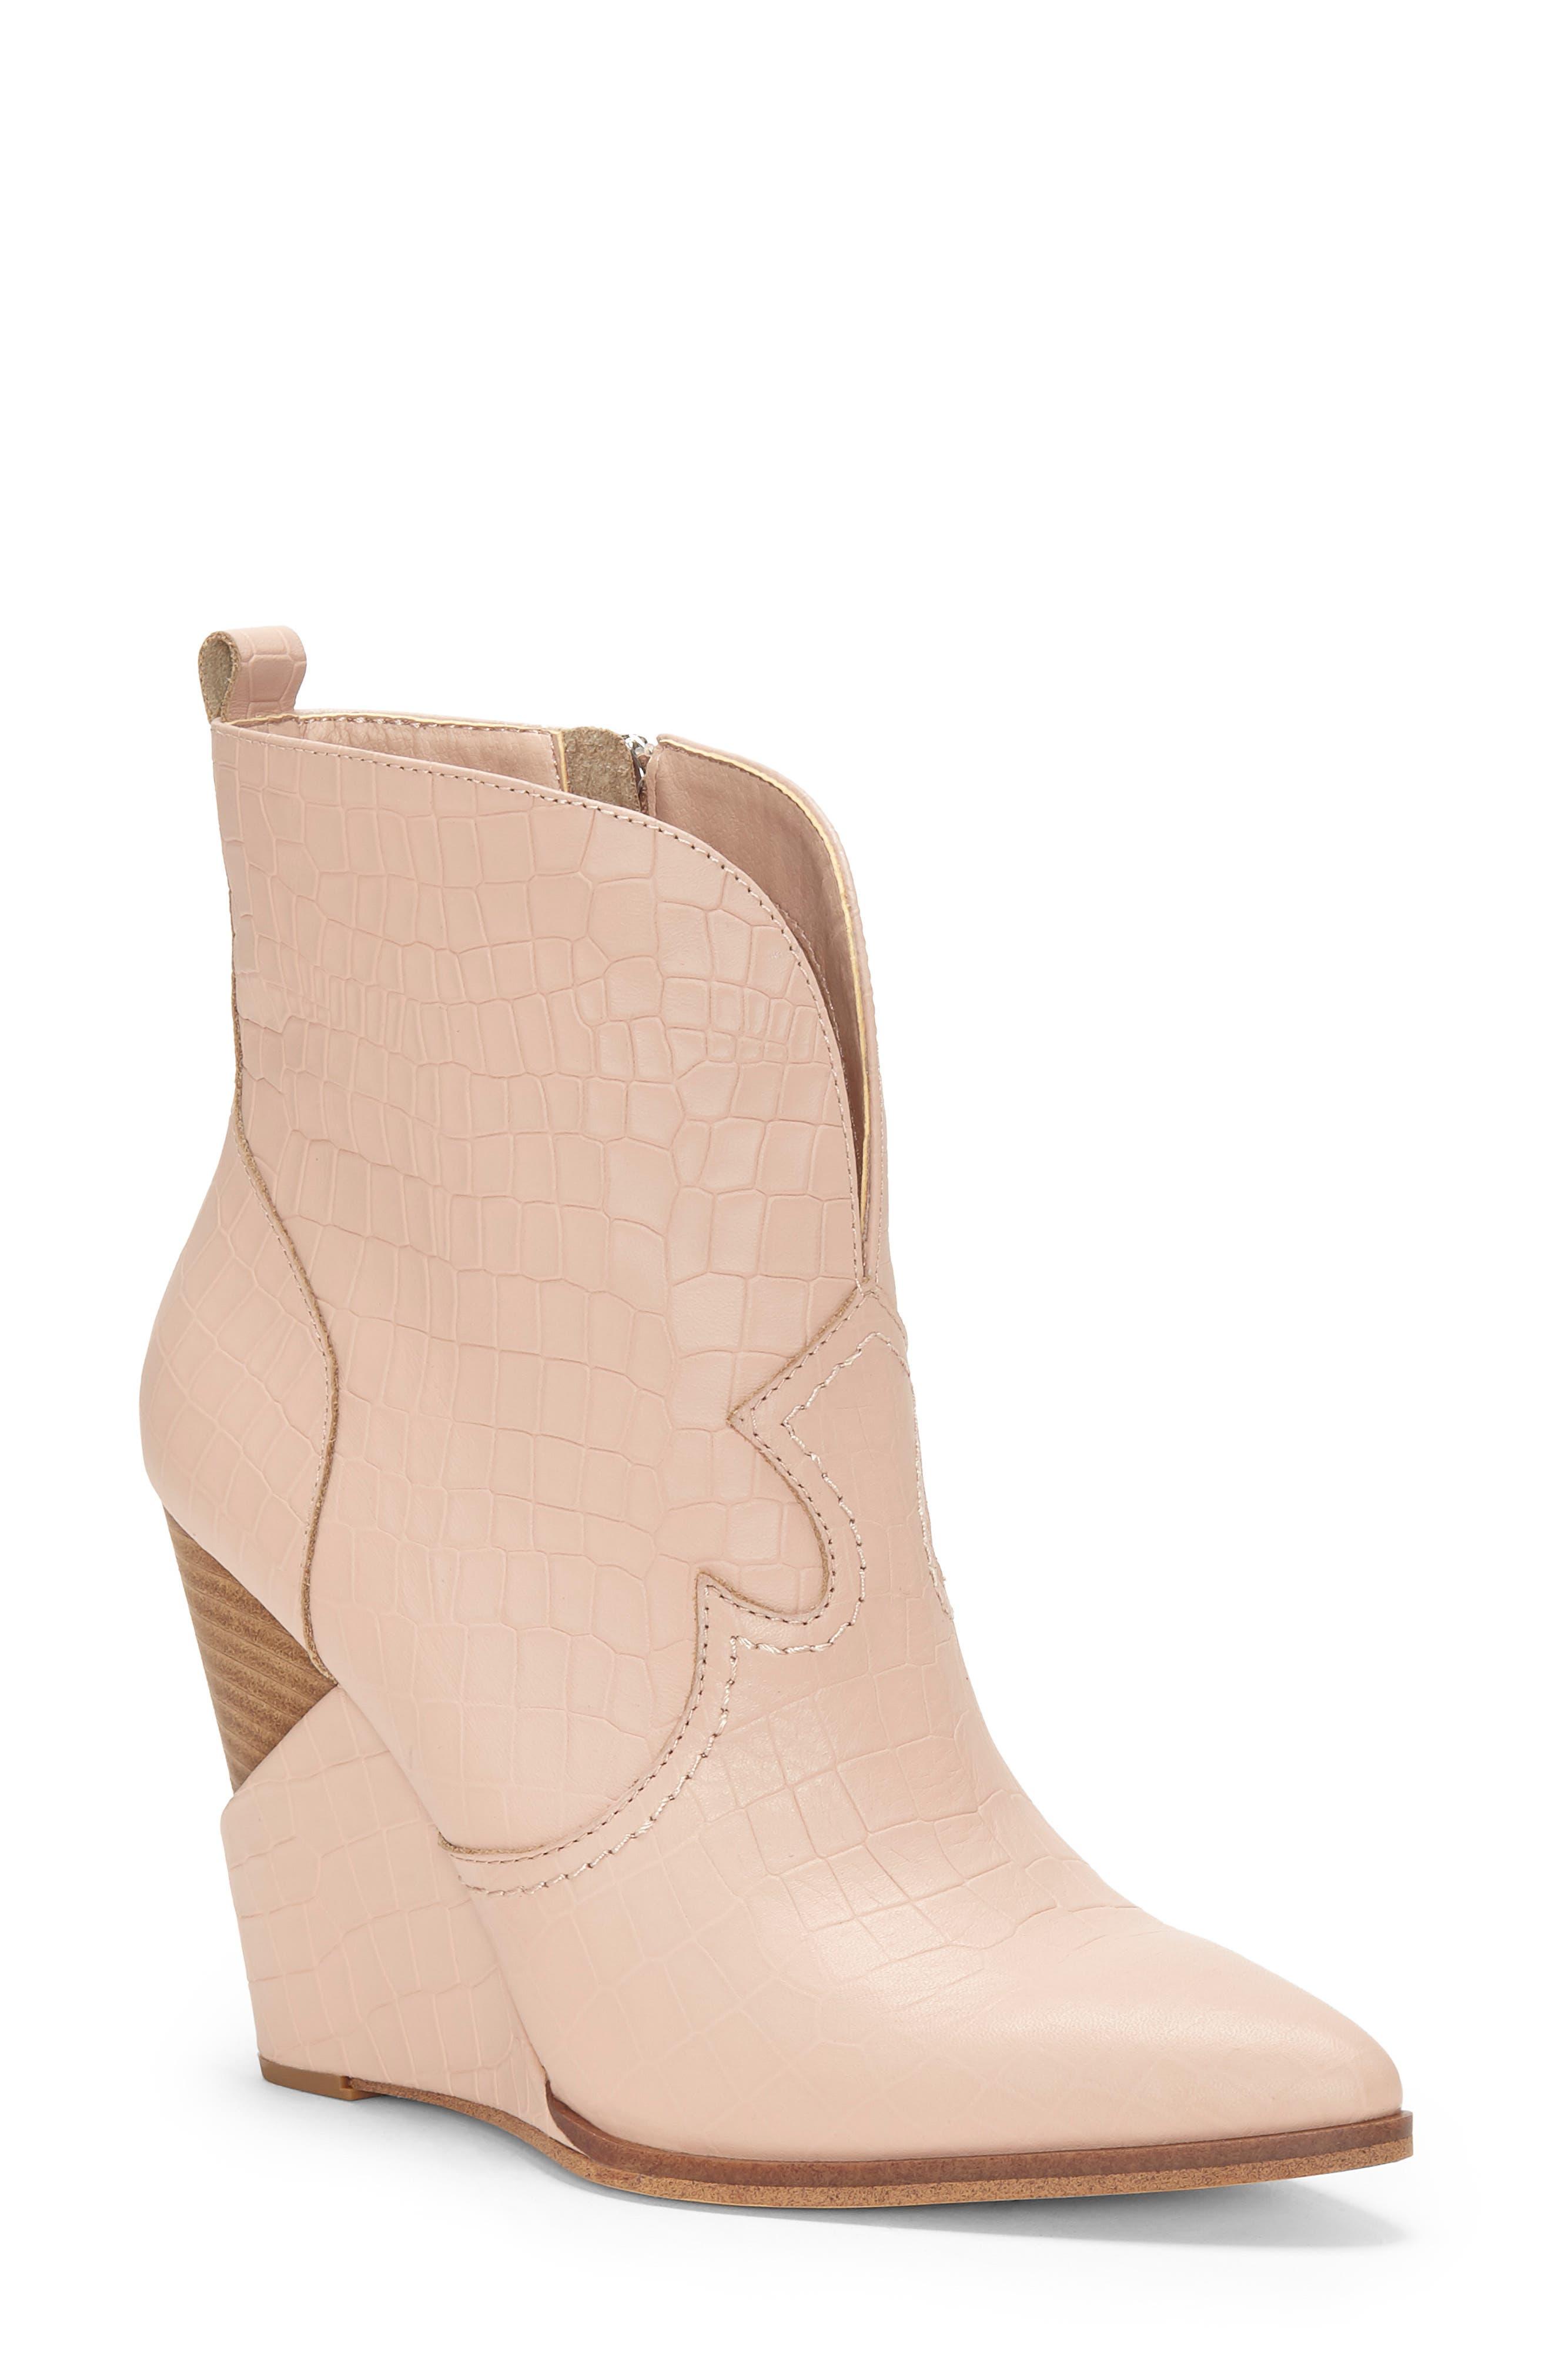 Jessica Simpson Hilrie Bootie, Pink